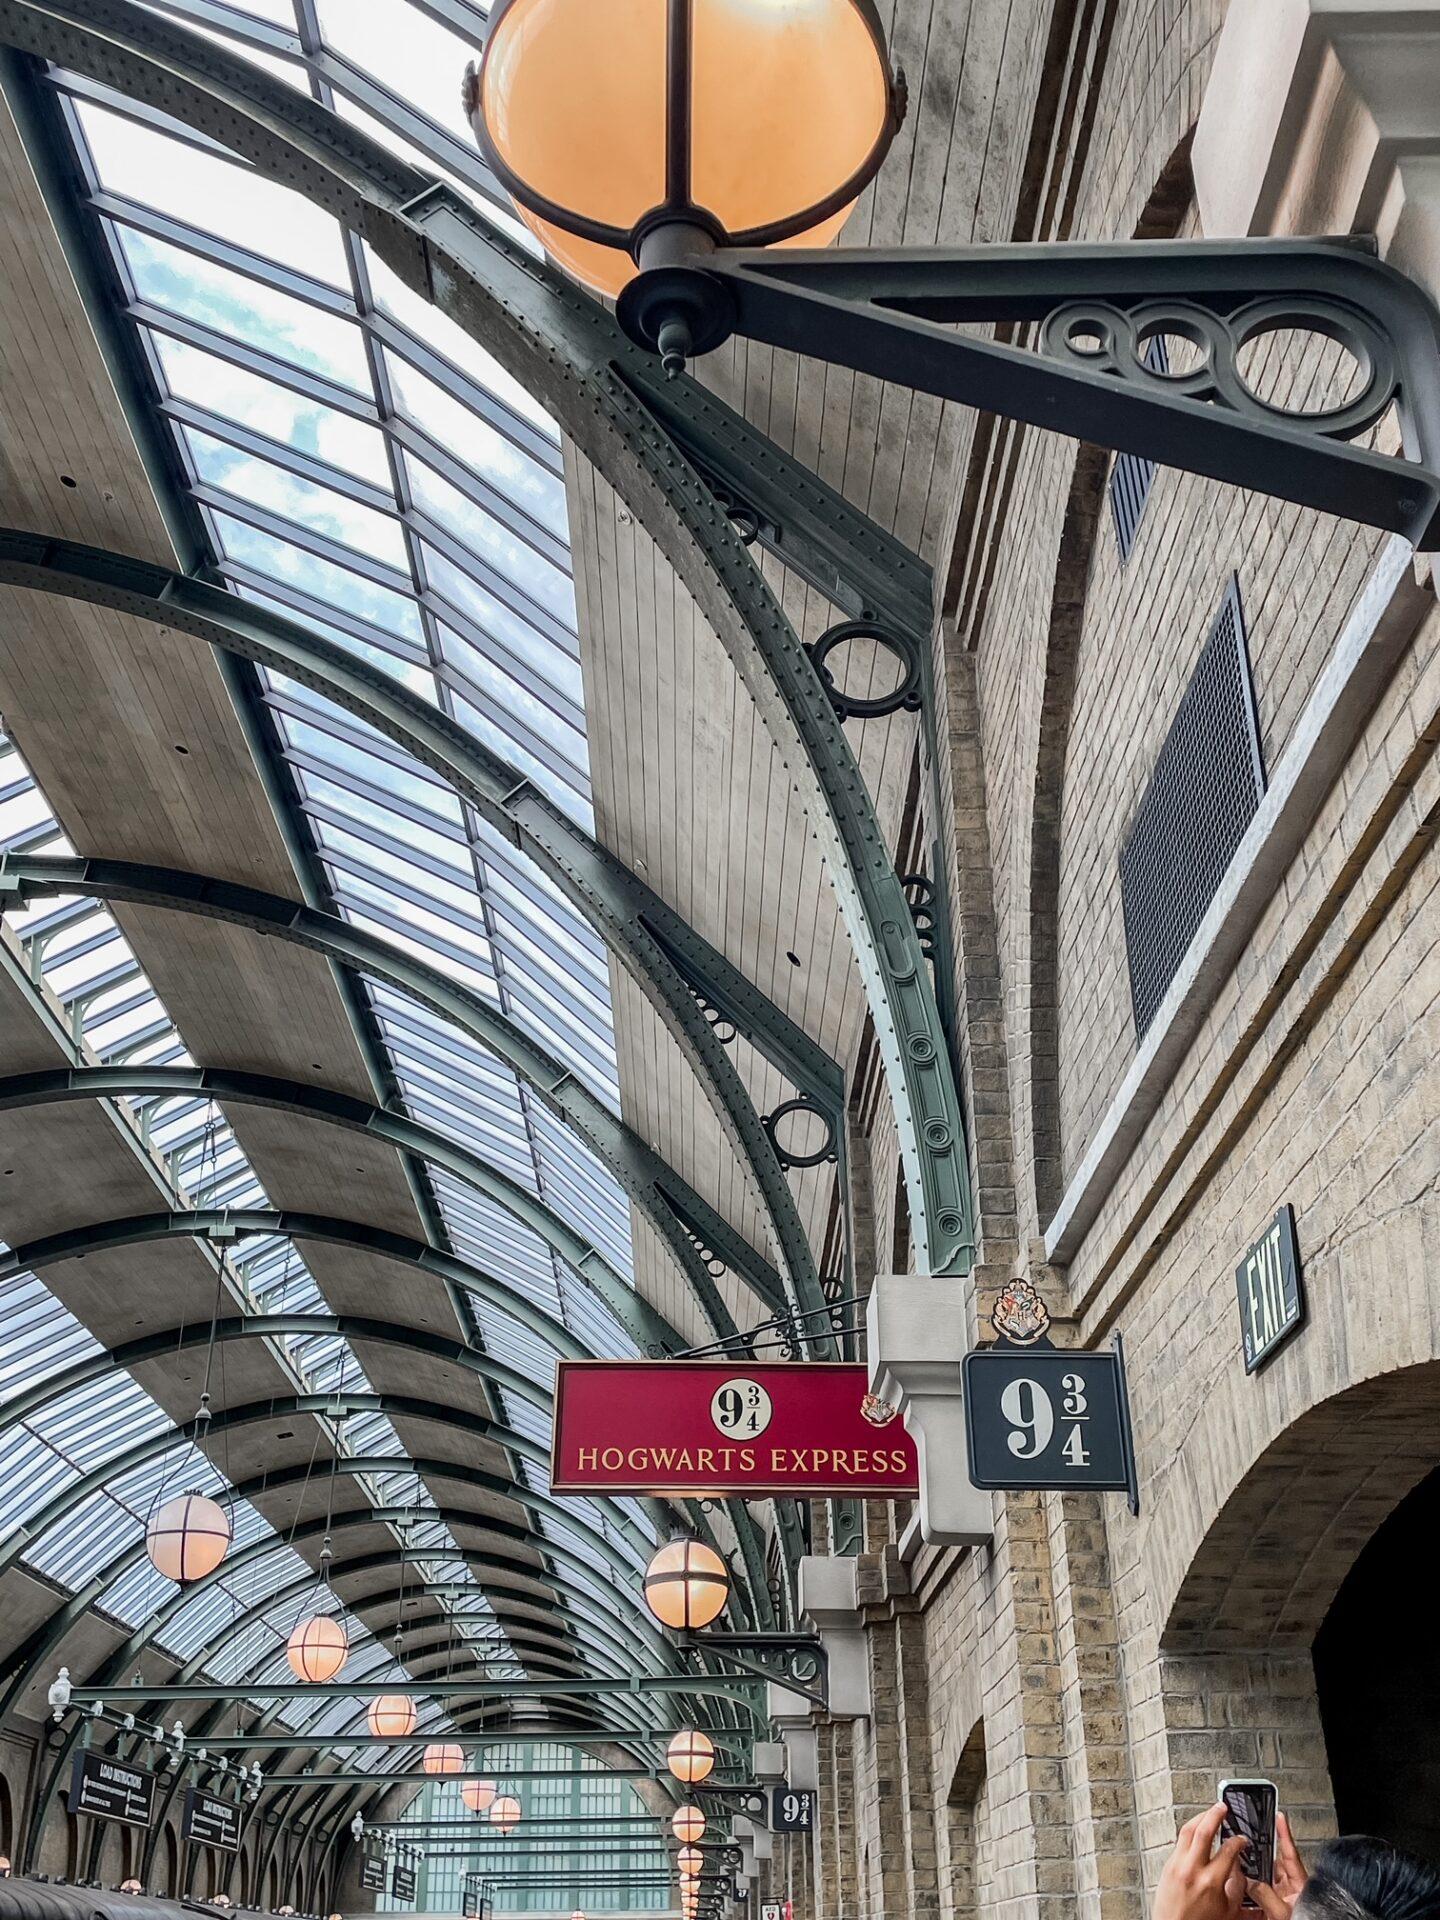 Platform 9 3/4 at King's Cross Station, Harry Potter World Universal Studios Orlando